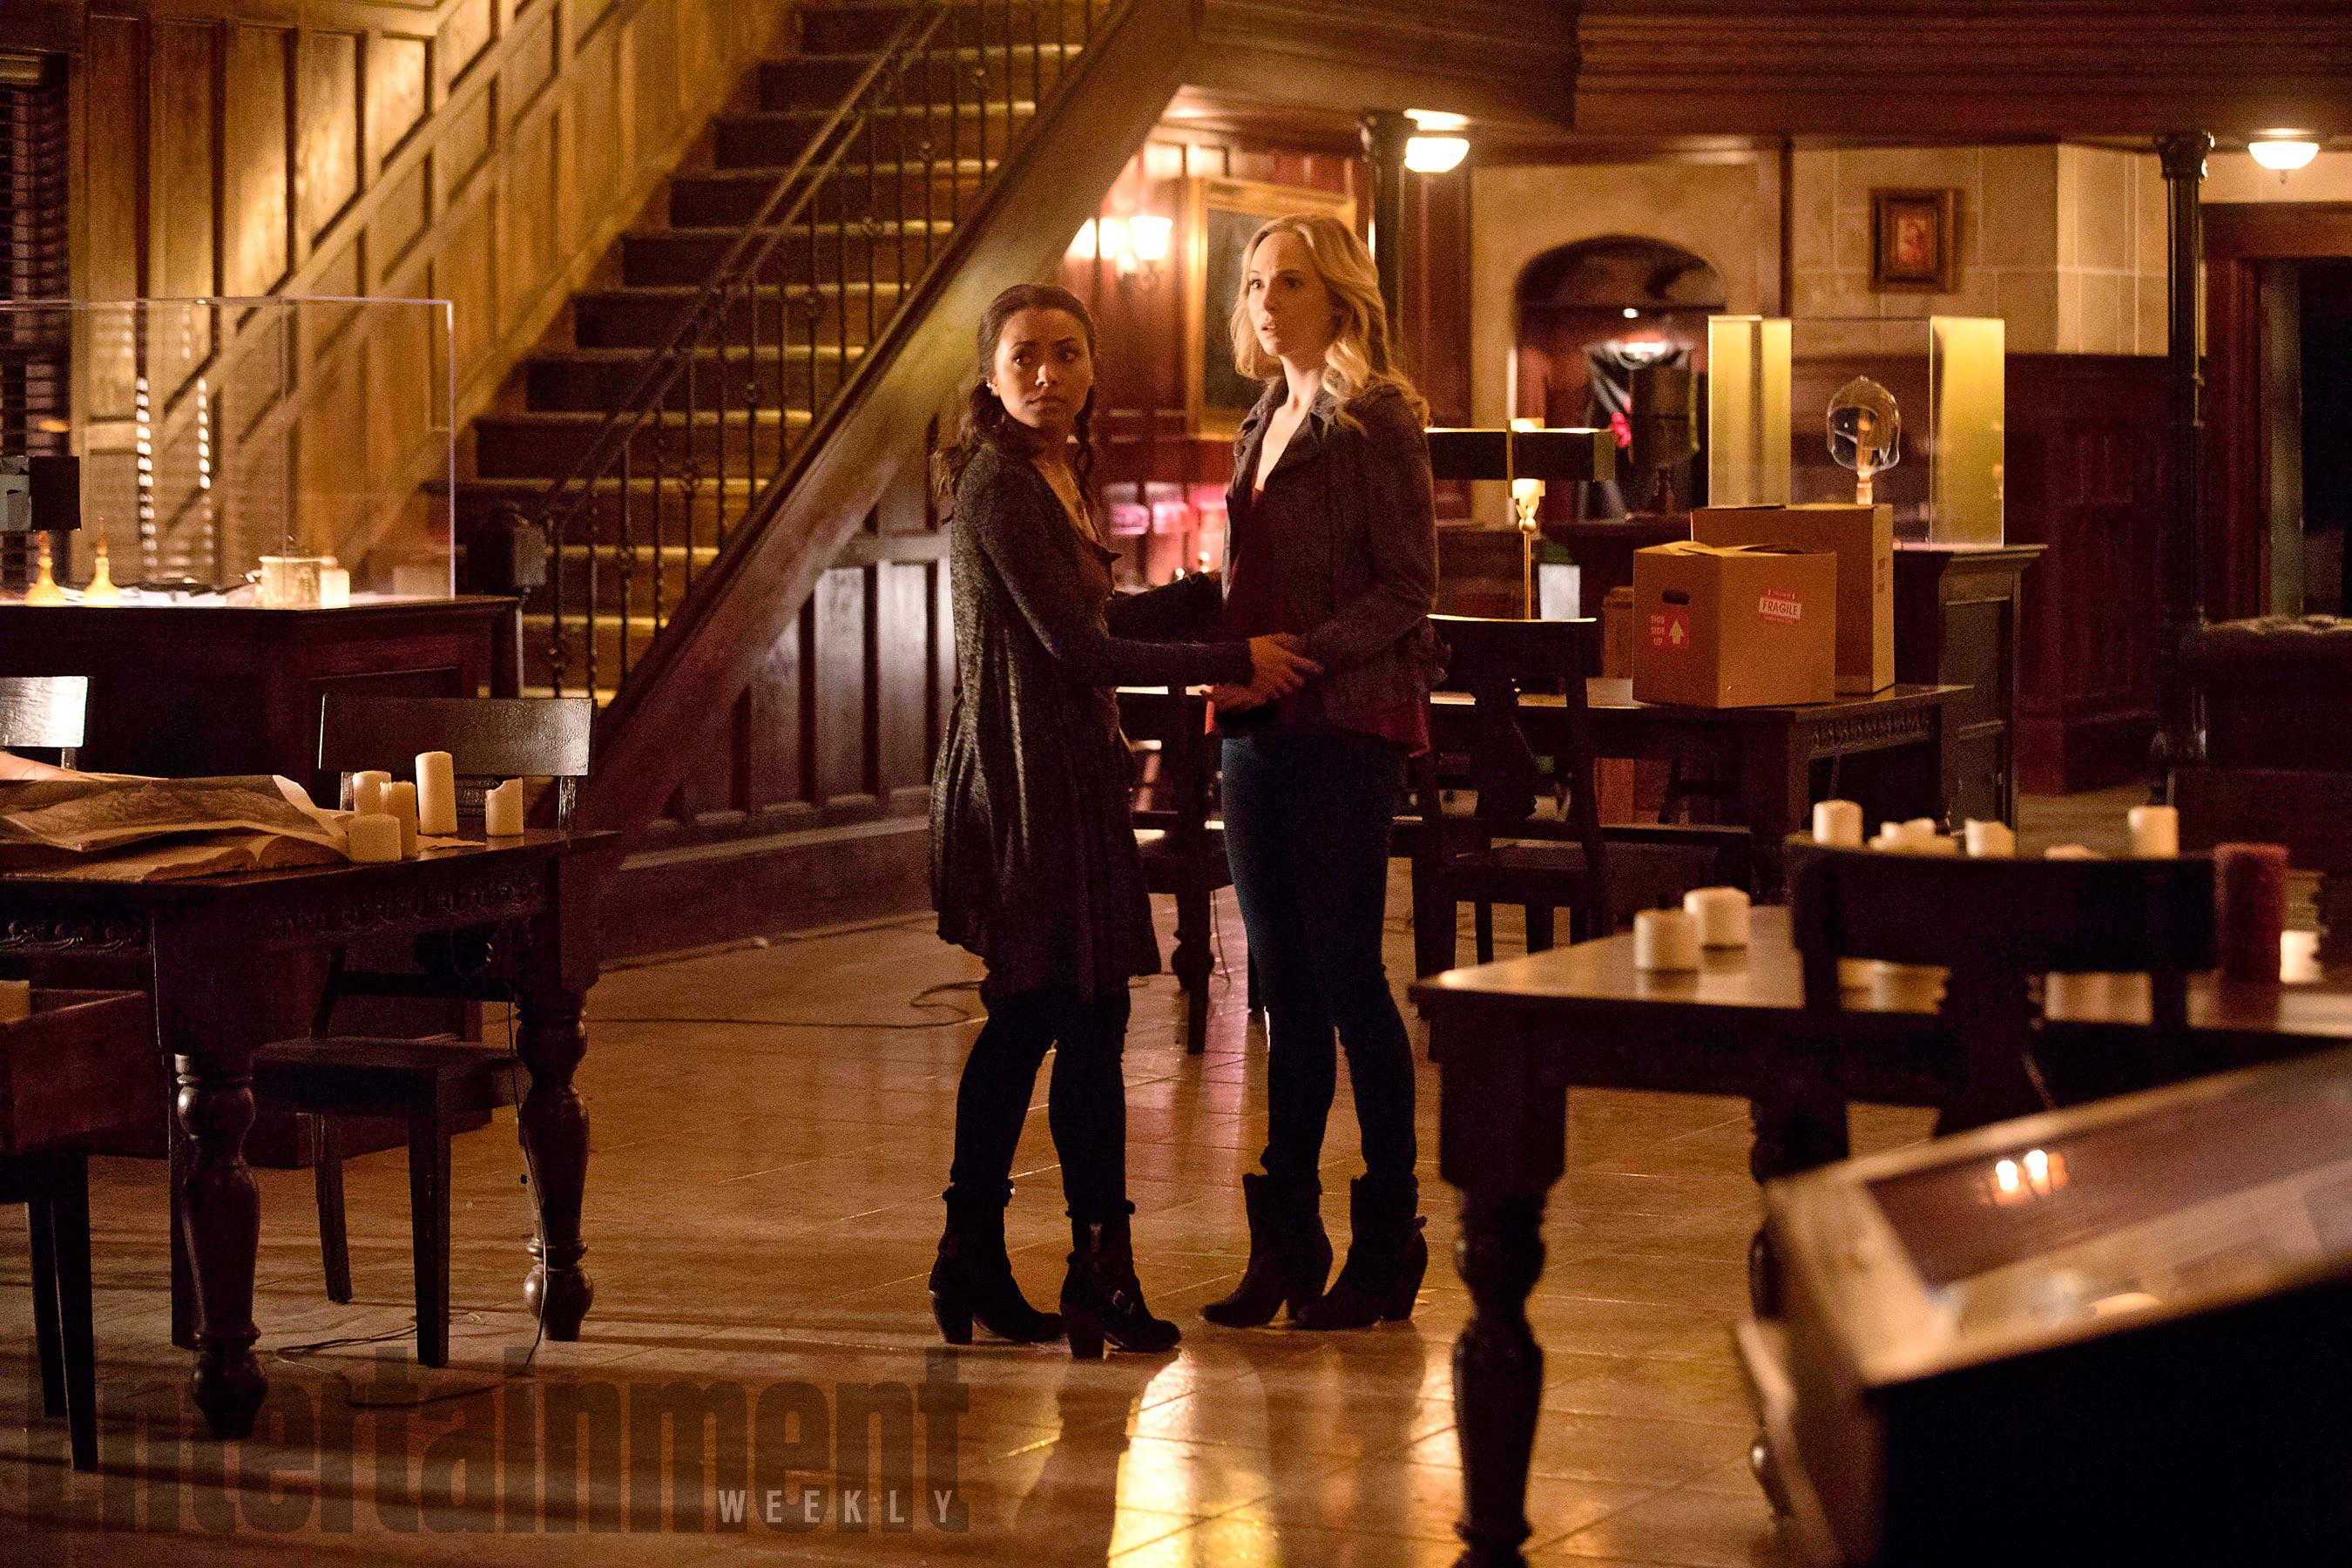 The Vampire Diaries Episode: I Was Feeling EpicSeason TK, Episode TKAir Date: Pictured (L-R): Kat Graham, Candice King